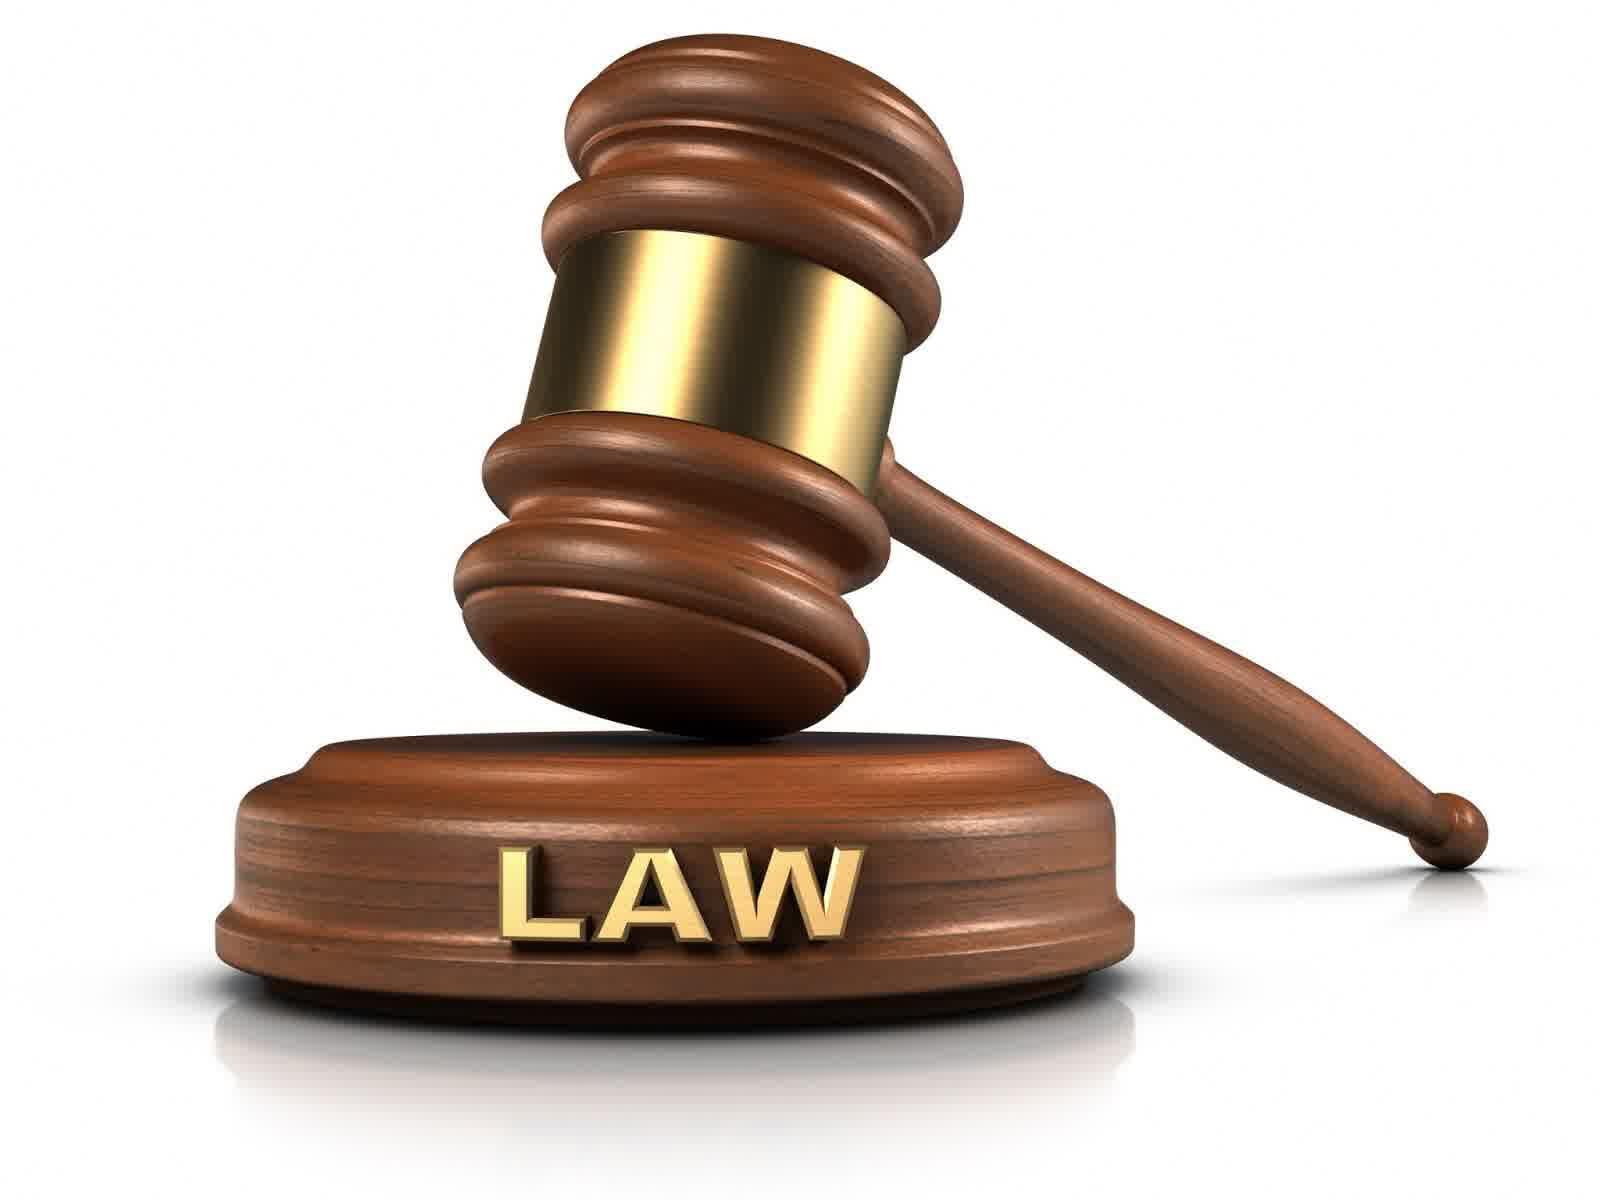 Kumpulan Peraturan Perundangan K3 (Keselamatan dan Kesehatan Kerja) Revisi Terbaru